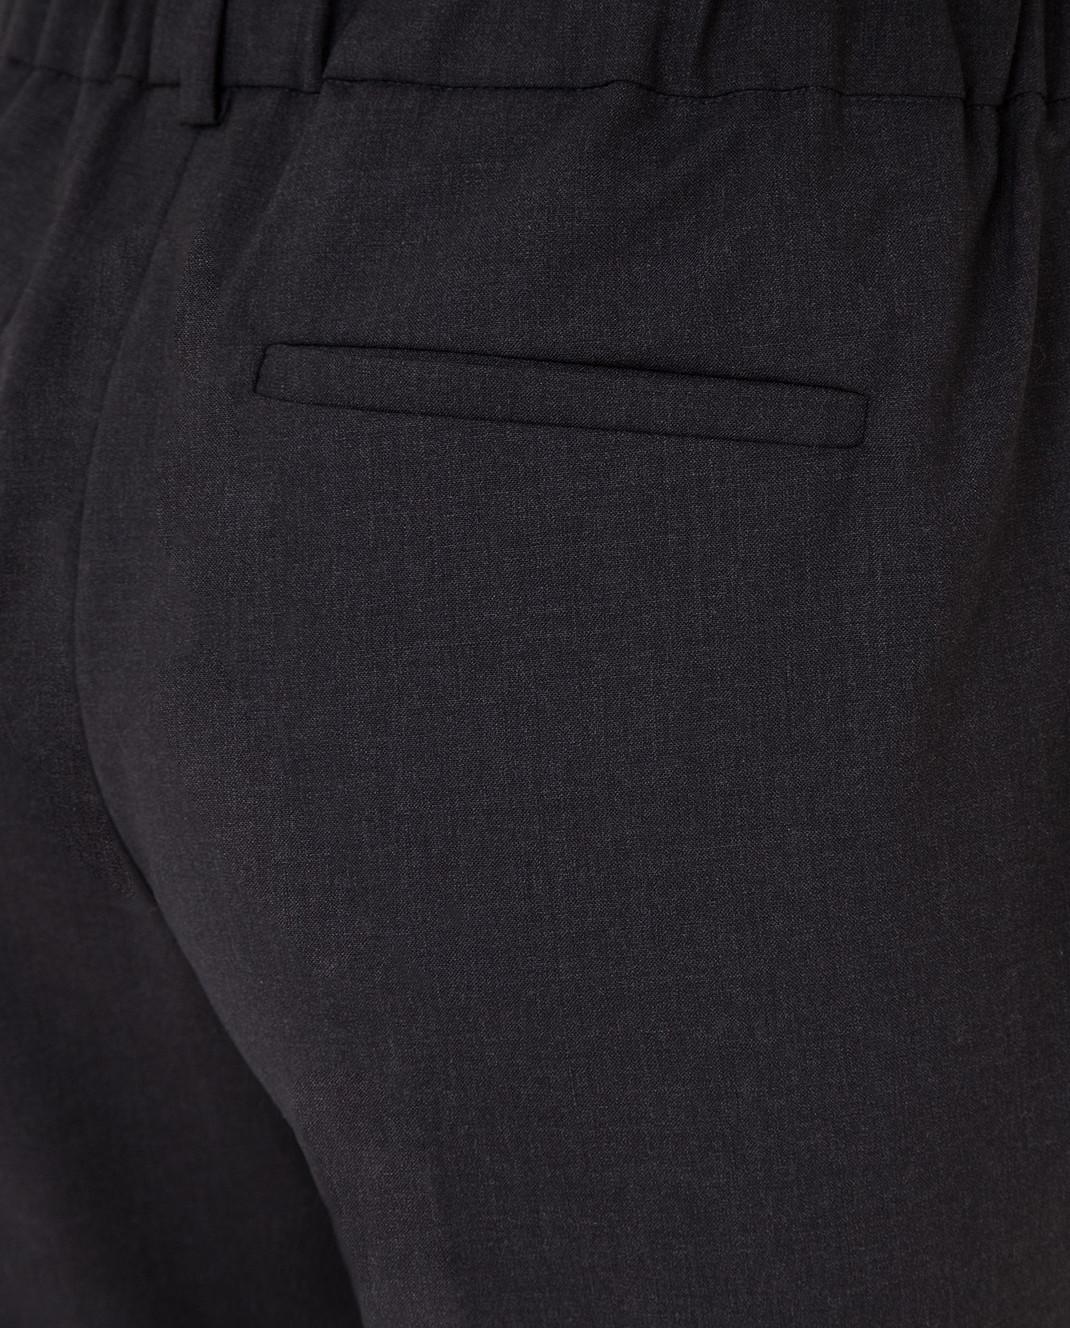 Brunello Cucinelli Темно-серые брюки из шерсти M0W07P6818 изображение 5